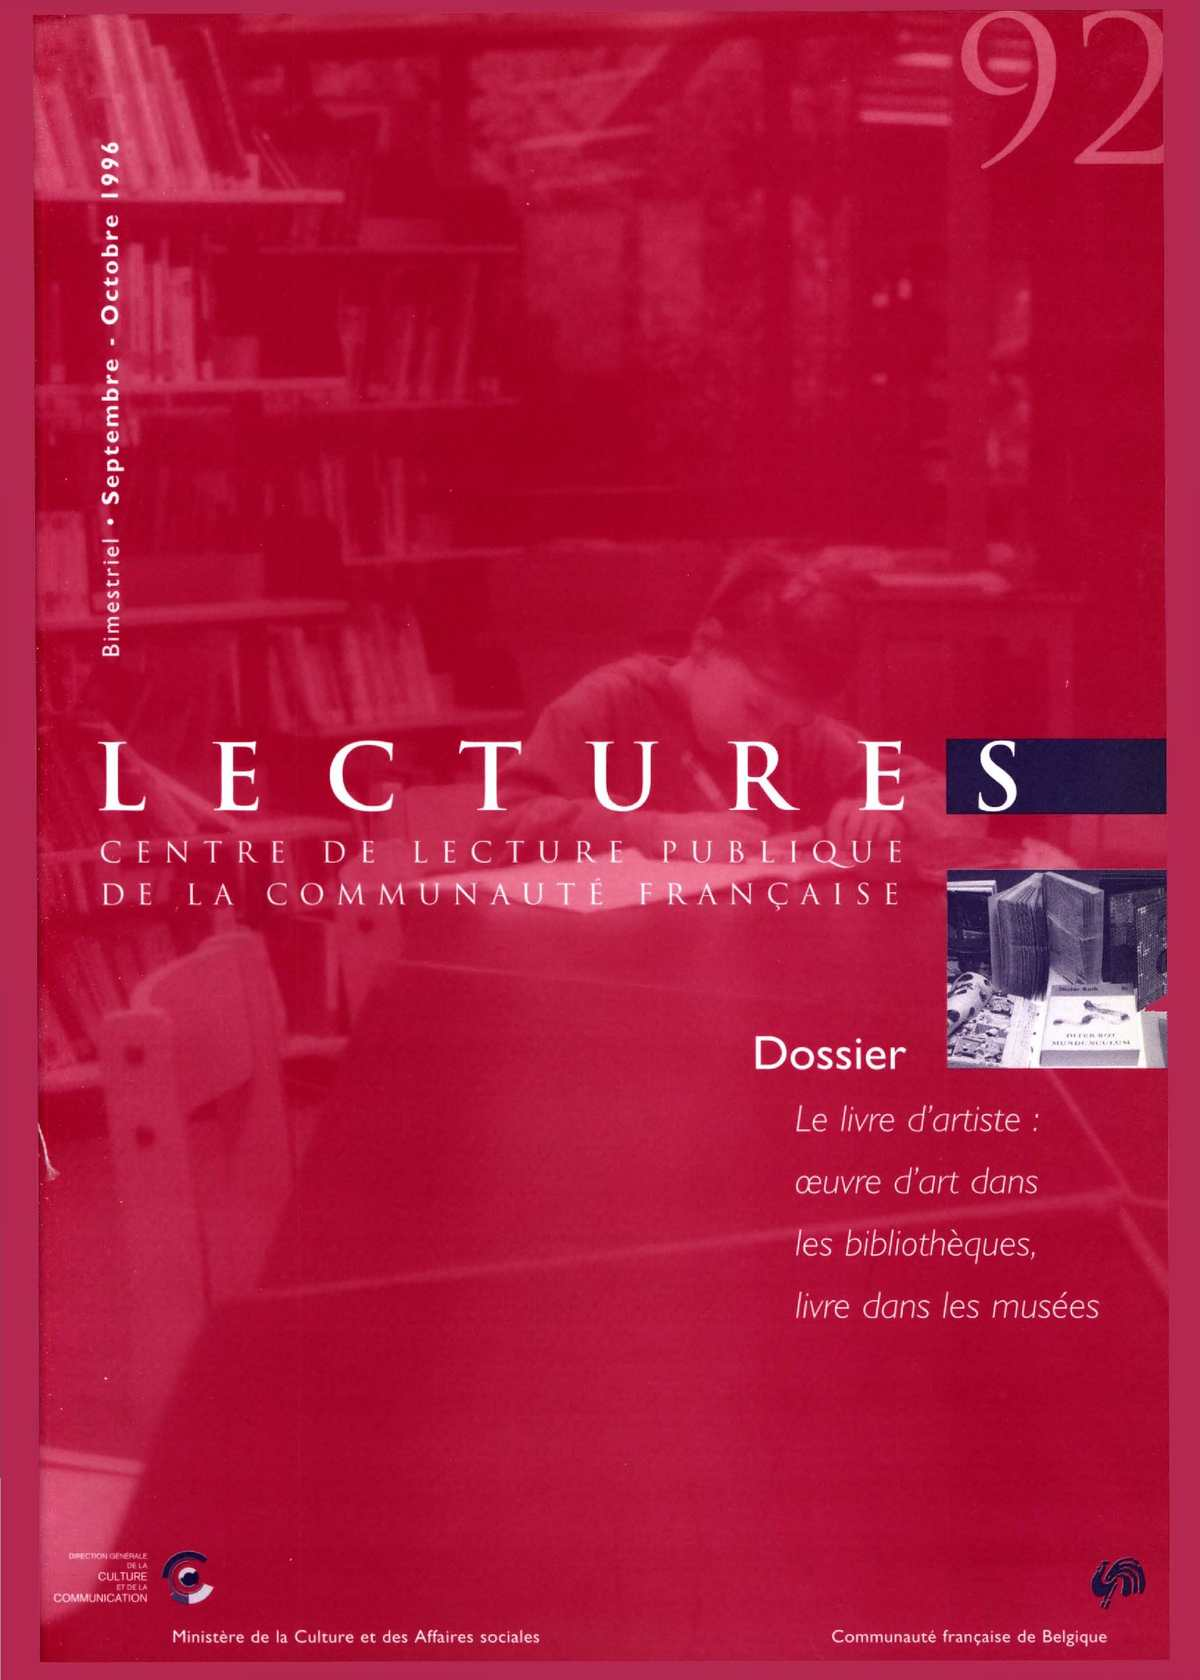 77c8d129f3c908 Calaméo - Lectures, 92, septembre - octobre 1996